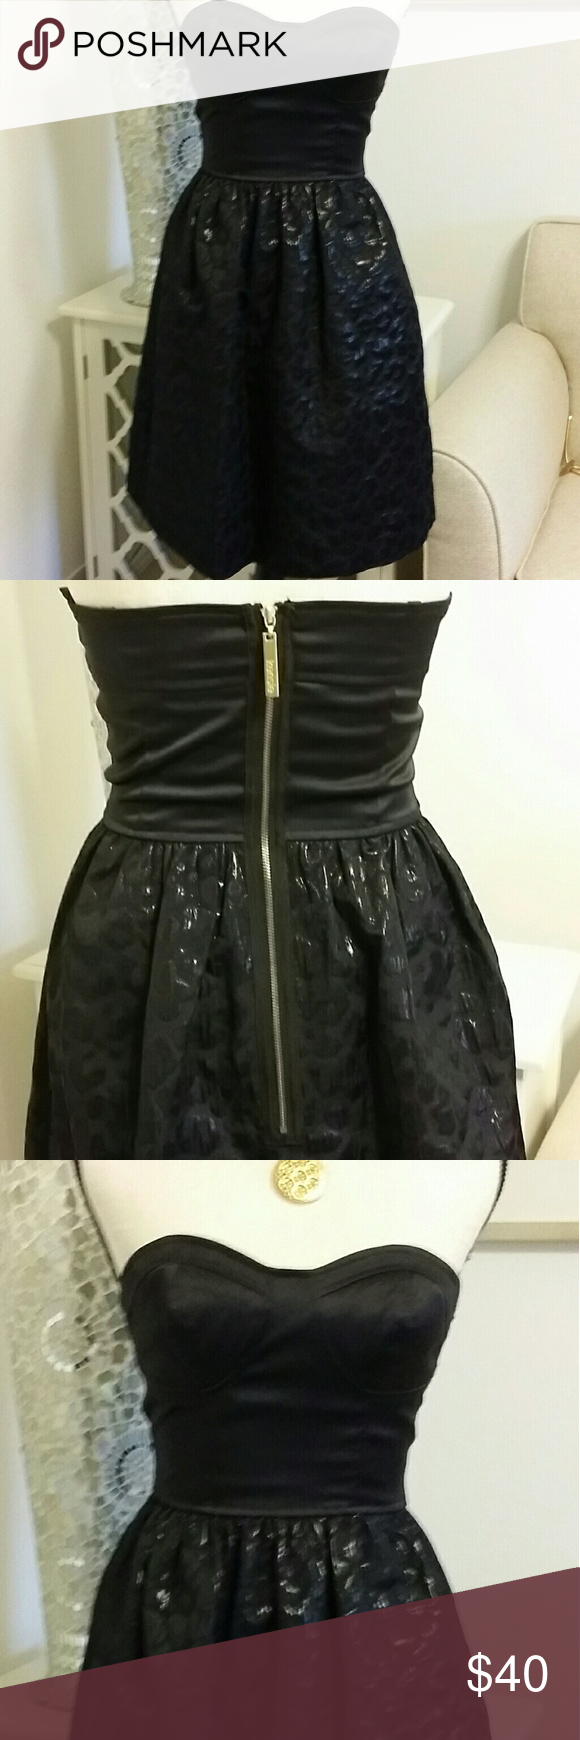 Kensie Black Cocktail Dress Gold Zipper Pinterest Strapless